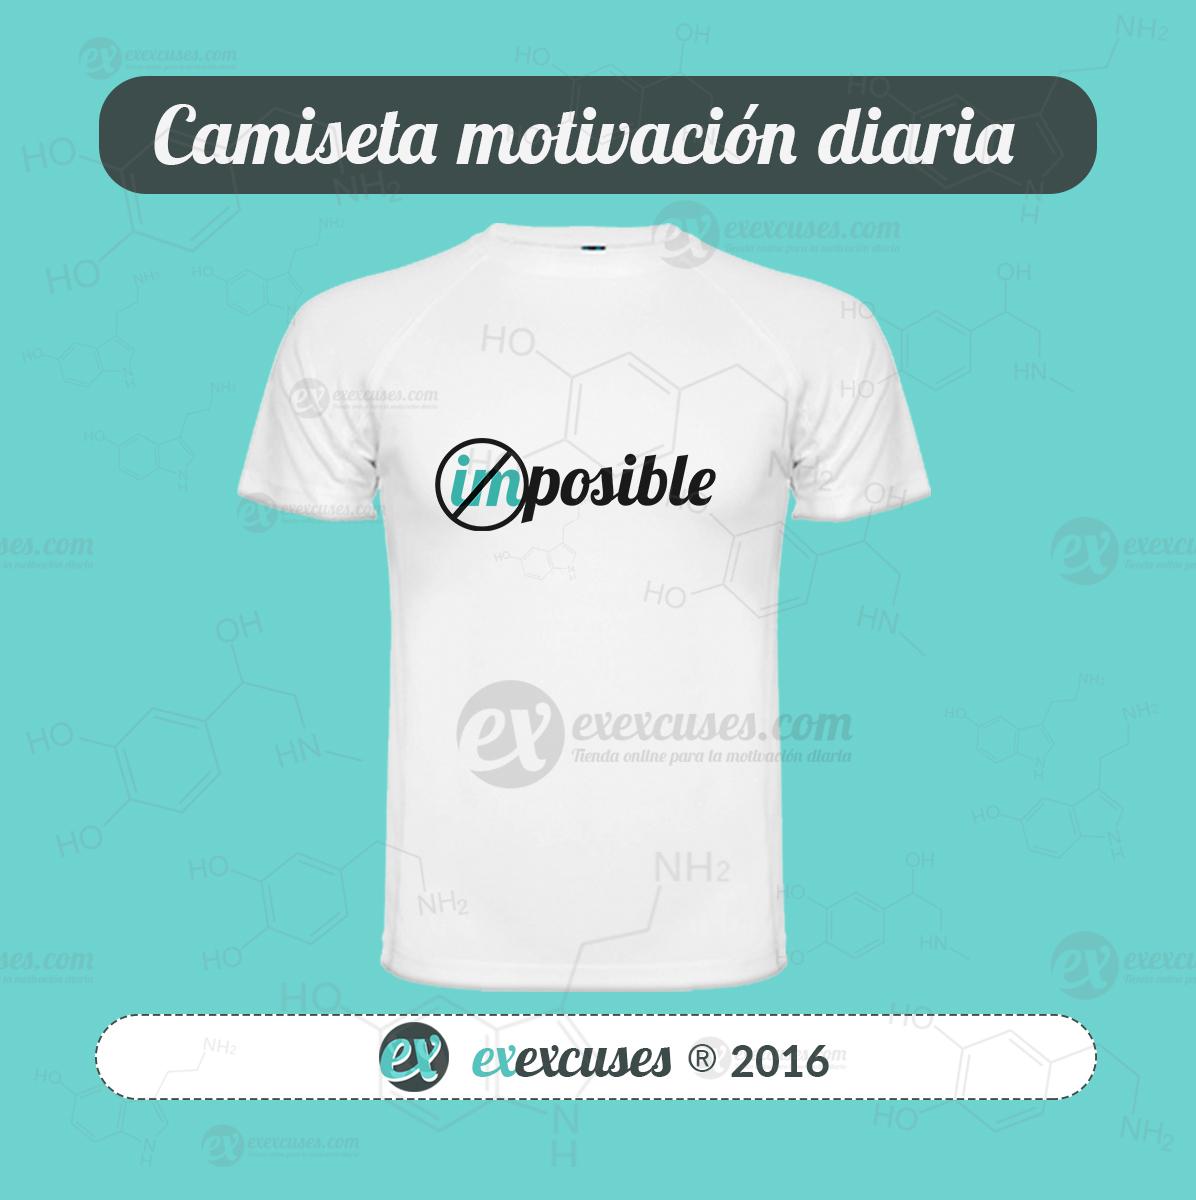 Camiseta imposible exexcuses®